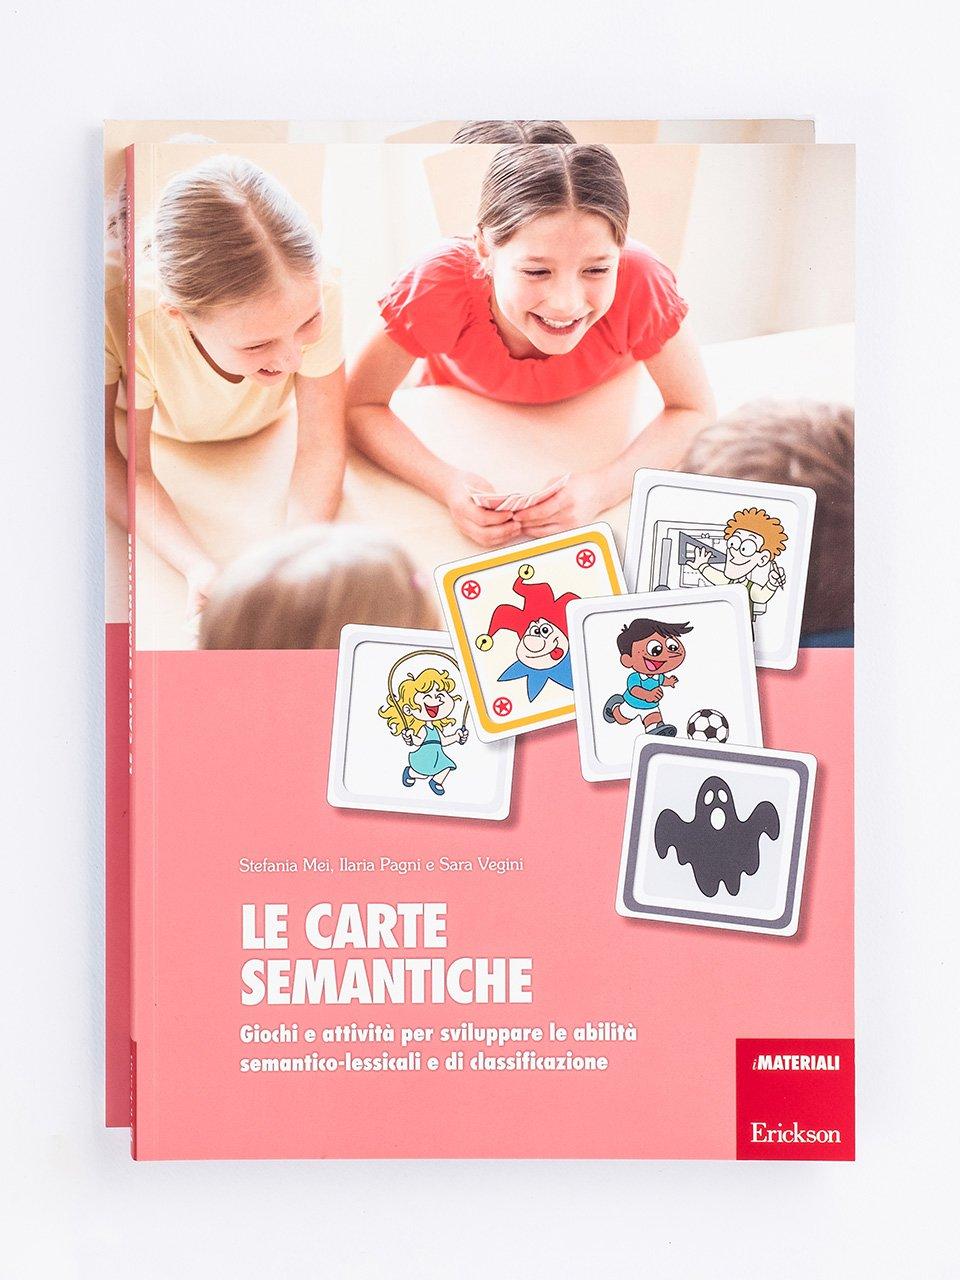 Le carte semantiche - Libri - Erickson